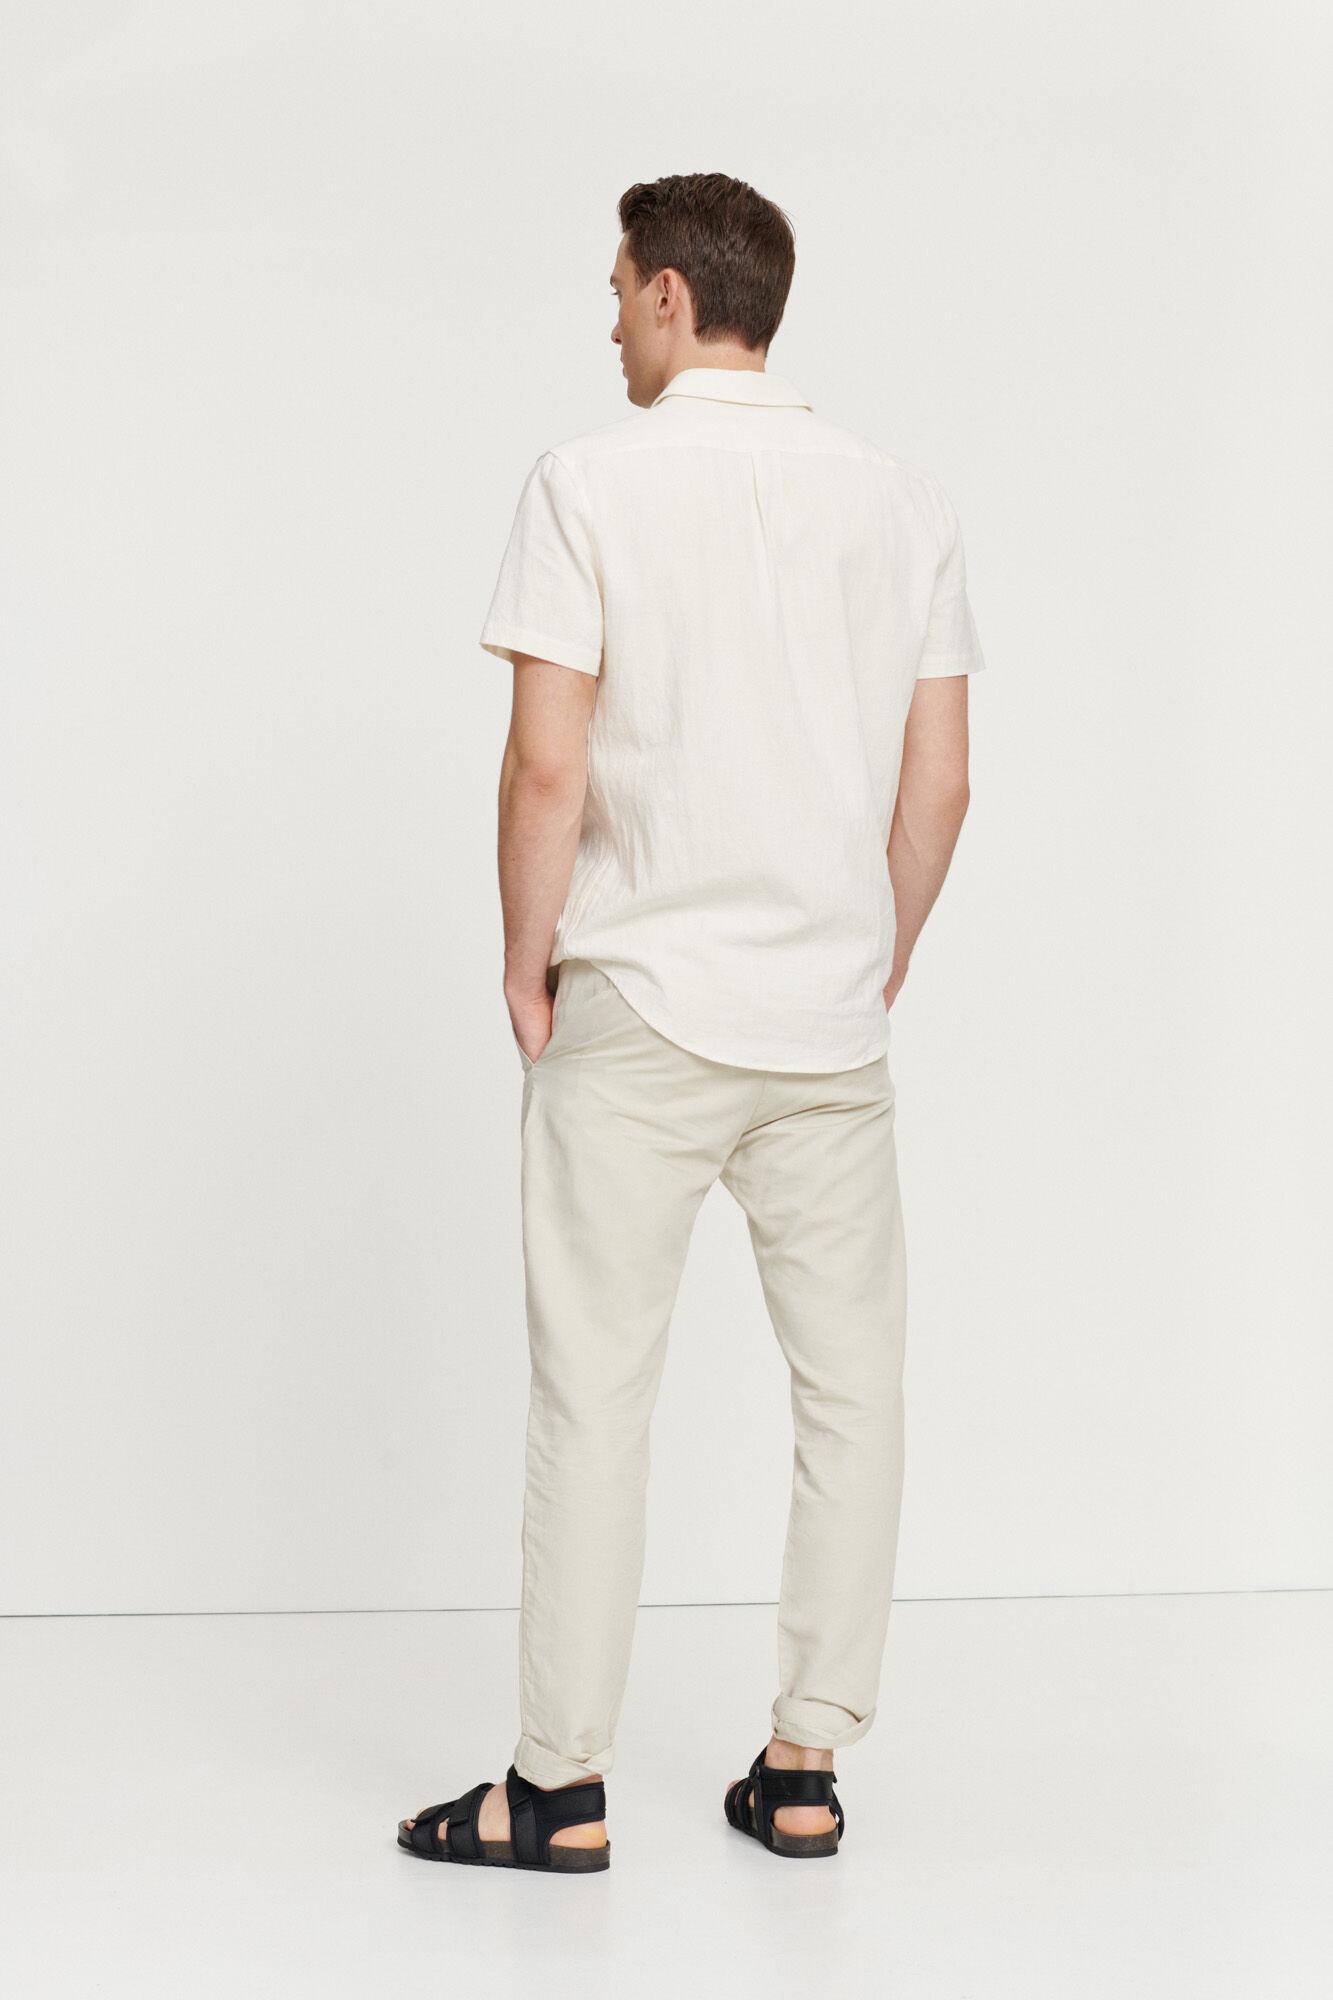 Vento NX Shirt 11532